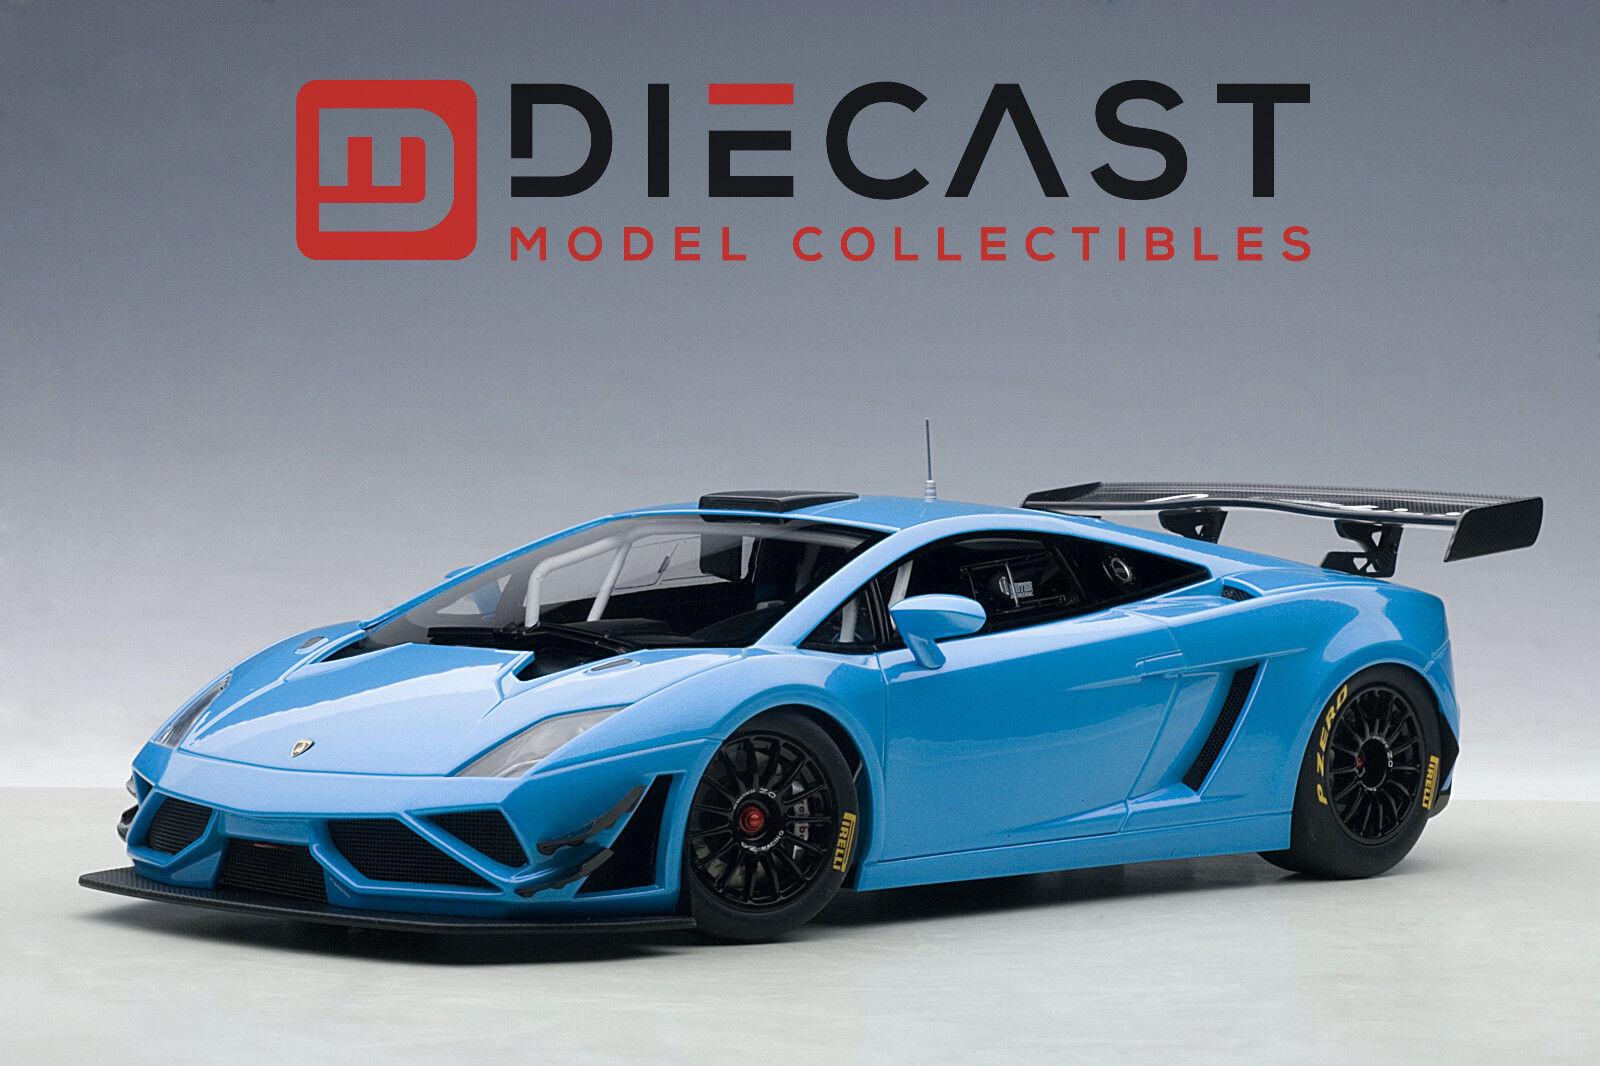 tienda en linea Autoart 81359 Lamborghini Gallardo GT3 FL2 2013, Azul, Azul, Azul, escala 1 18TH  hasta 42% de descuento